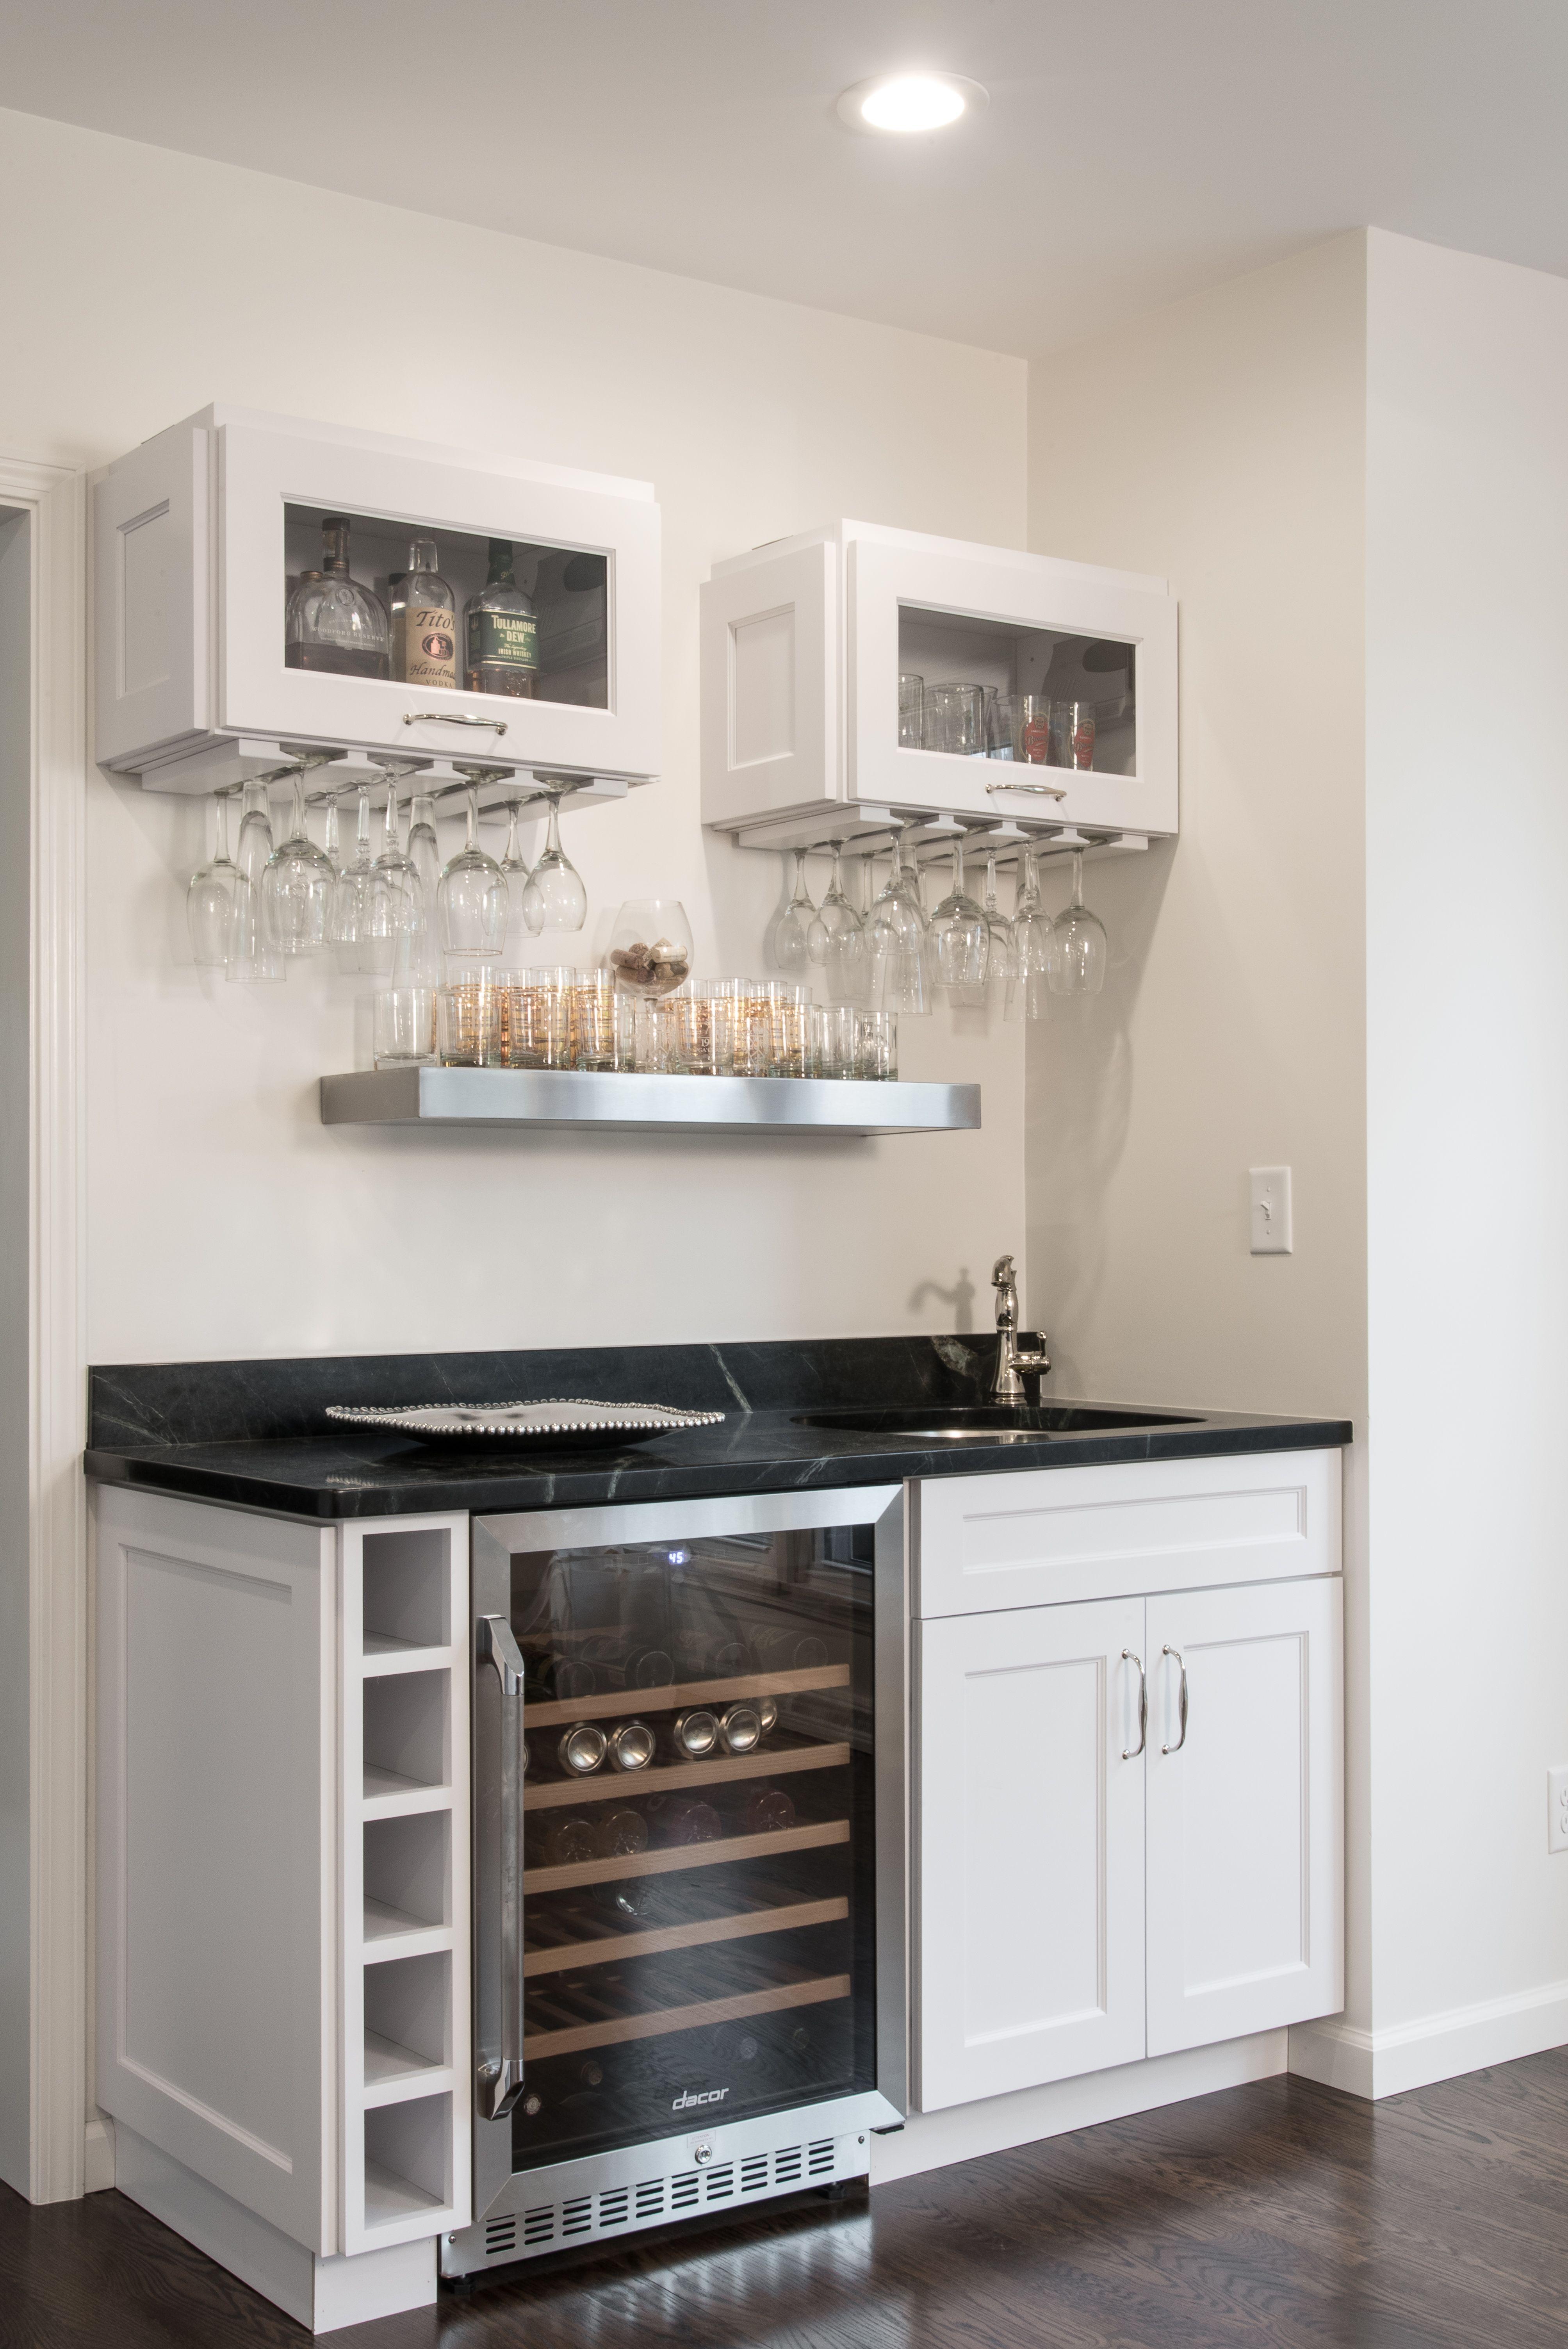 Pin On Rsi Kitchen Remodels